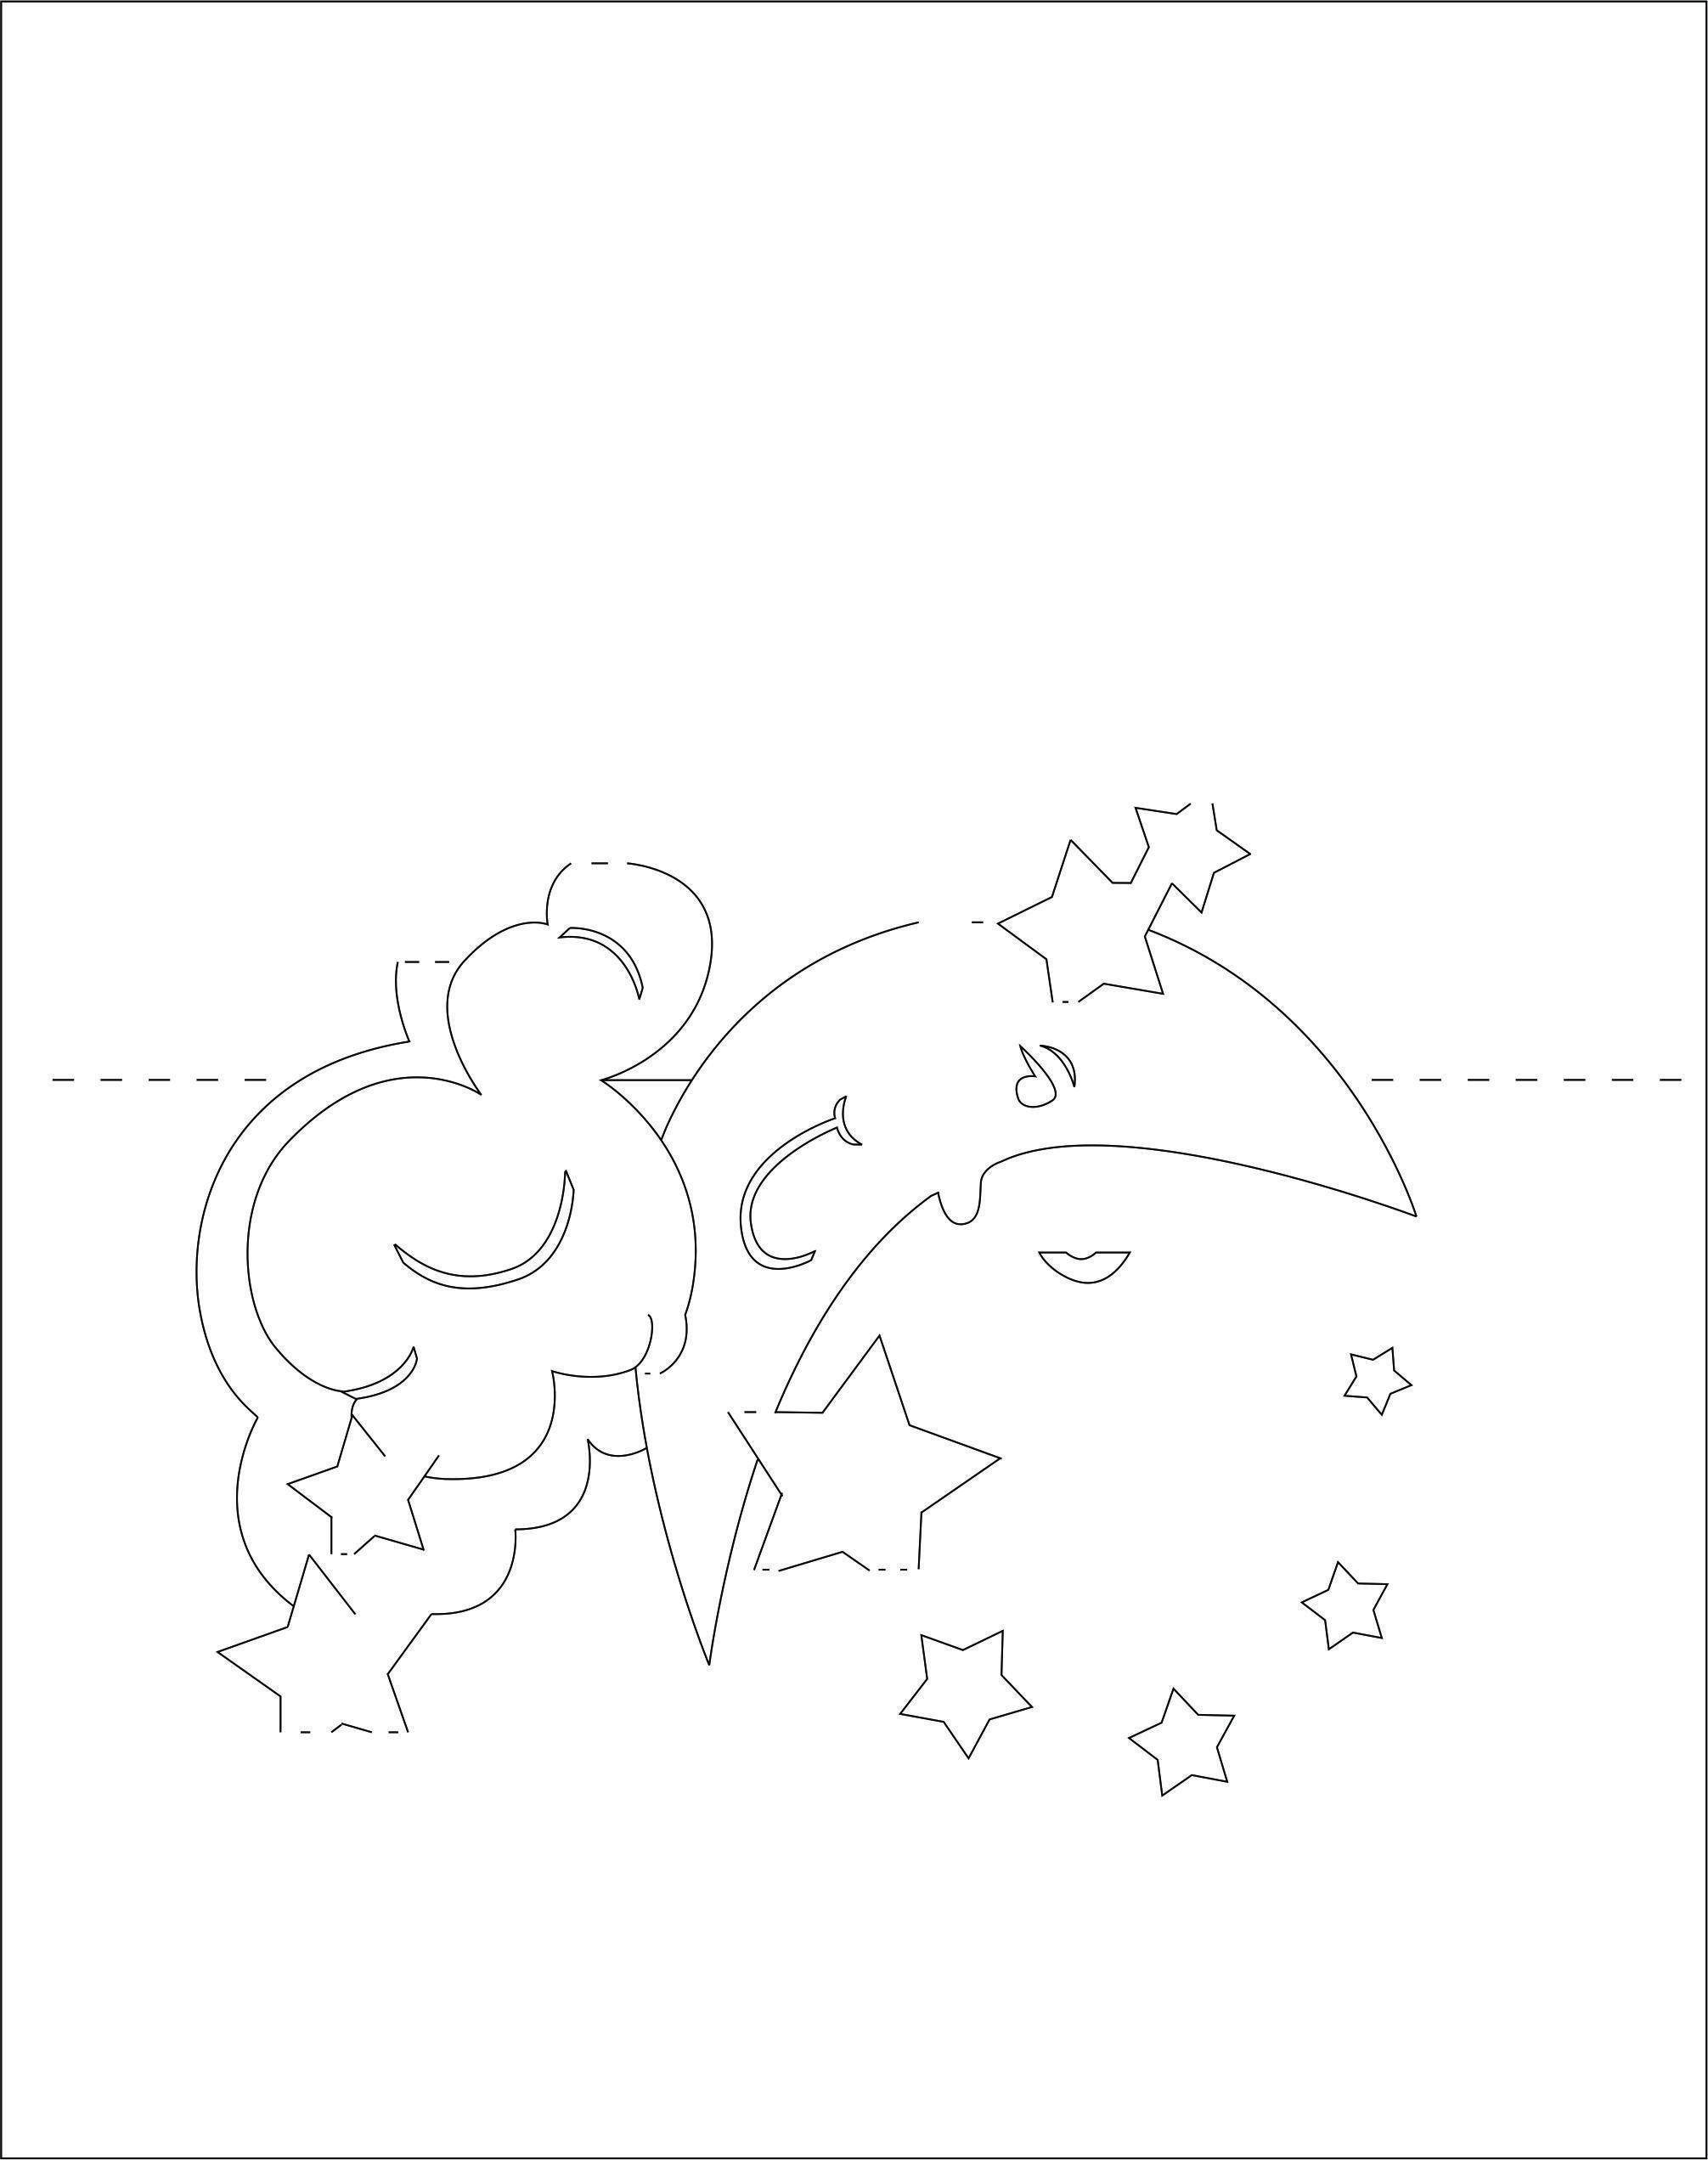 Шаблоны объемных открыток шаблон и схема